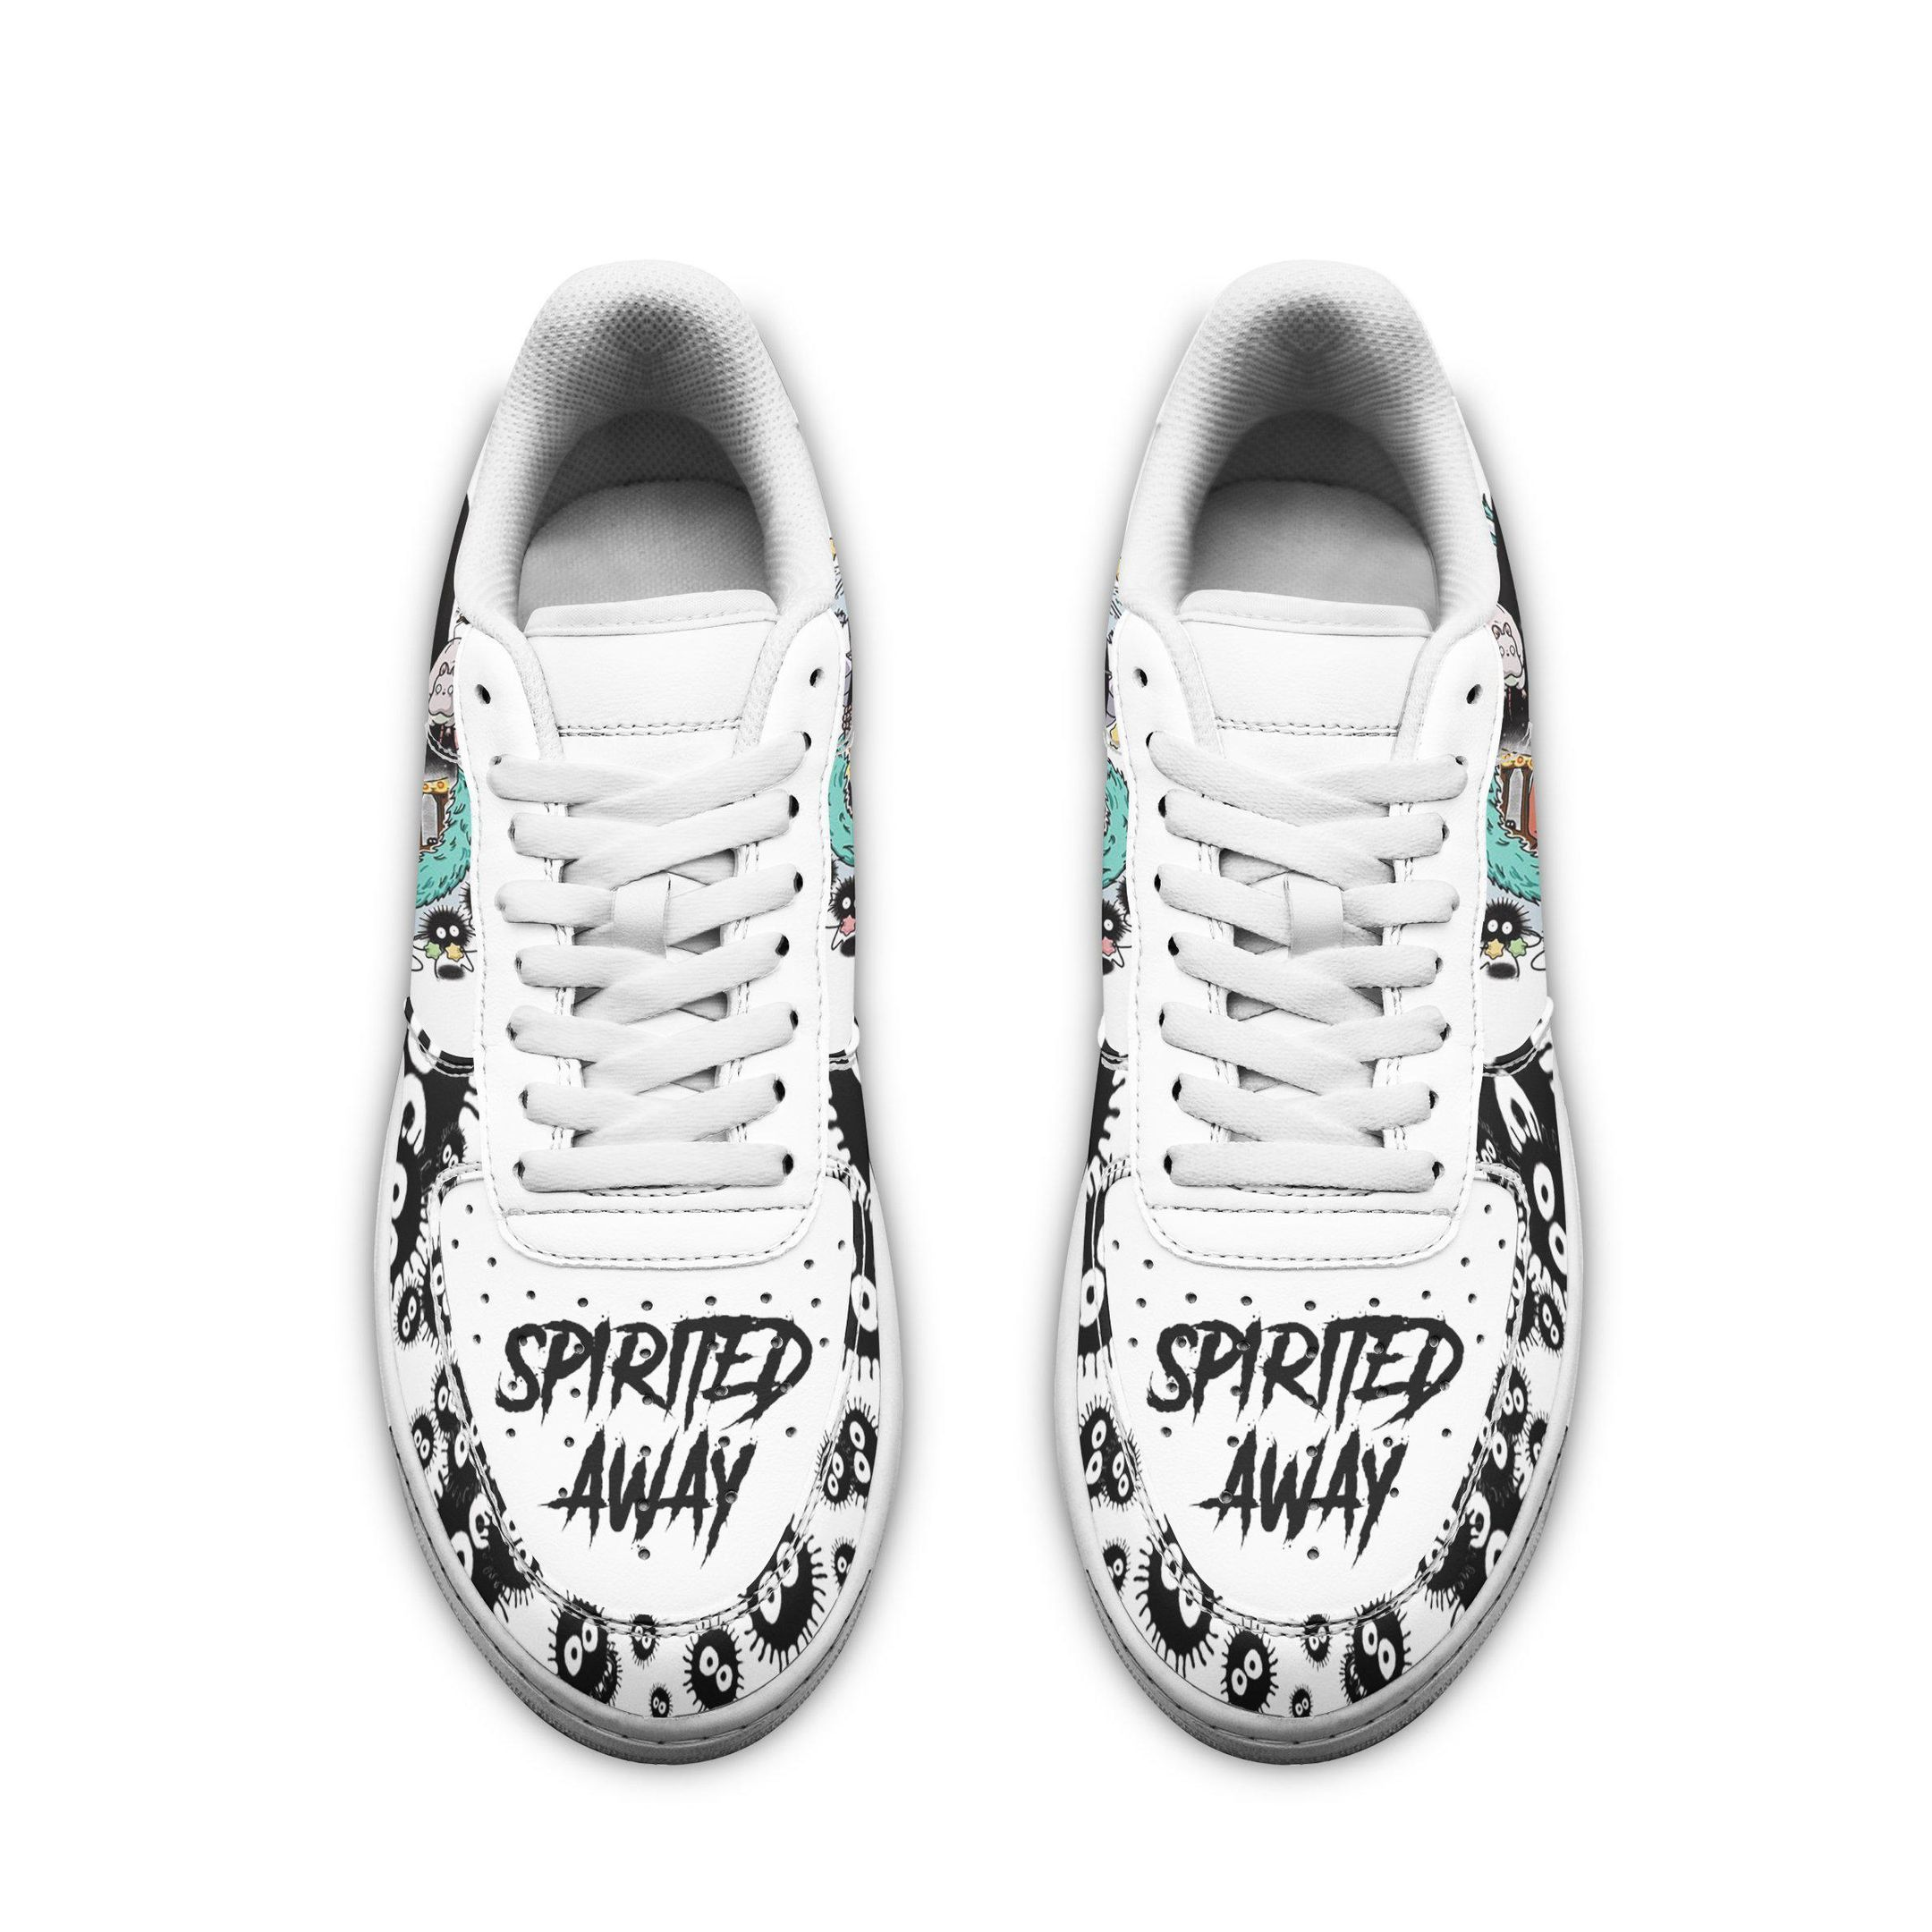 No Face Chichiro Air Shoes Spirited Away Anime Shoes Fan Gift GO1012